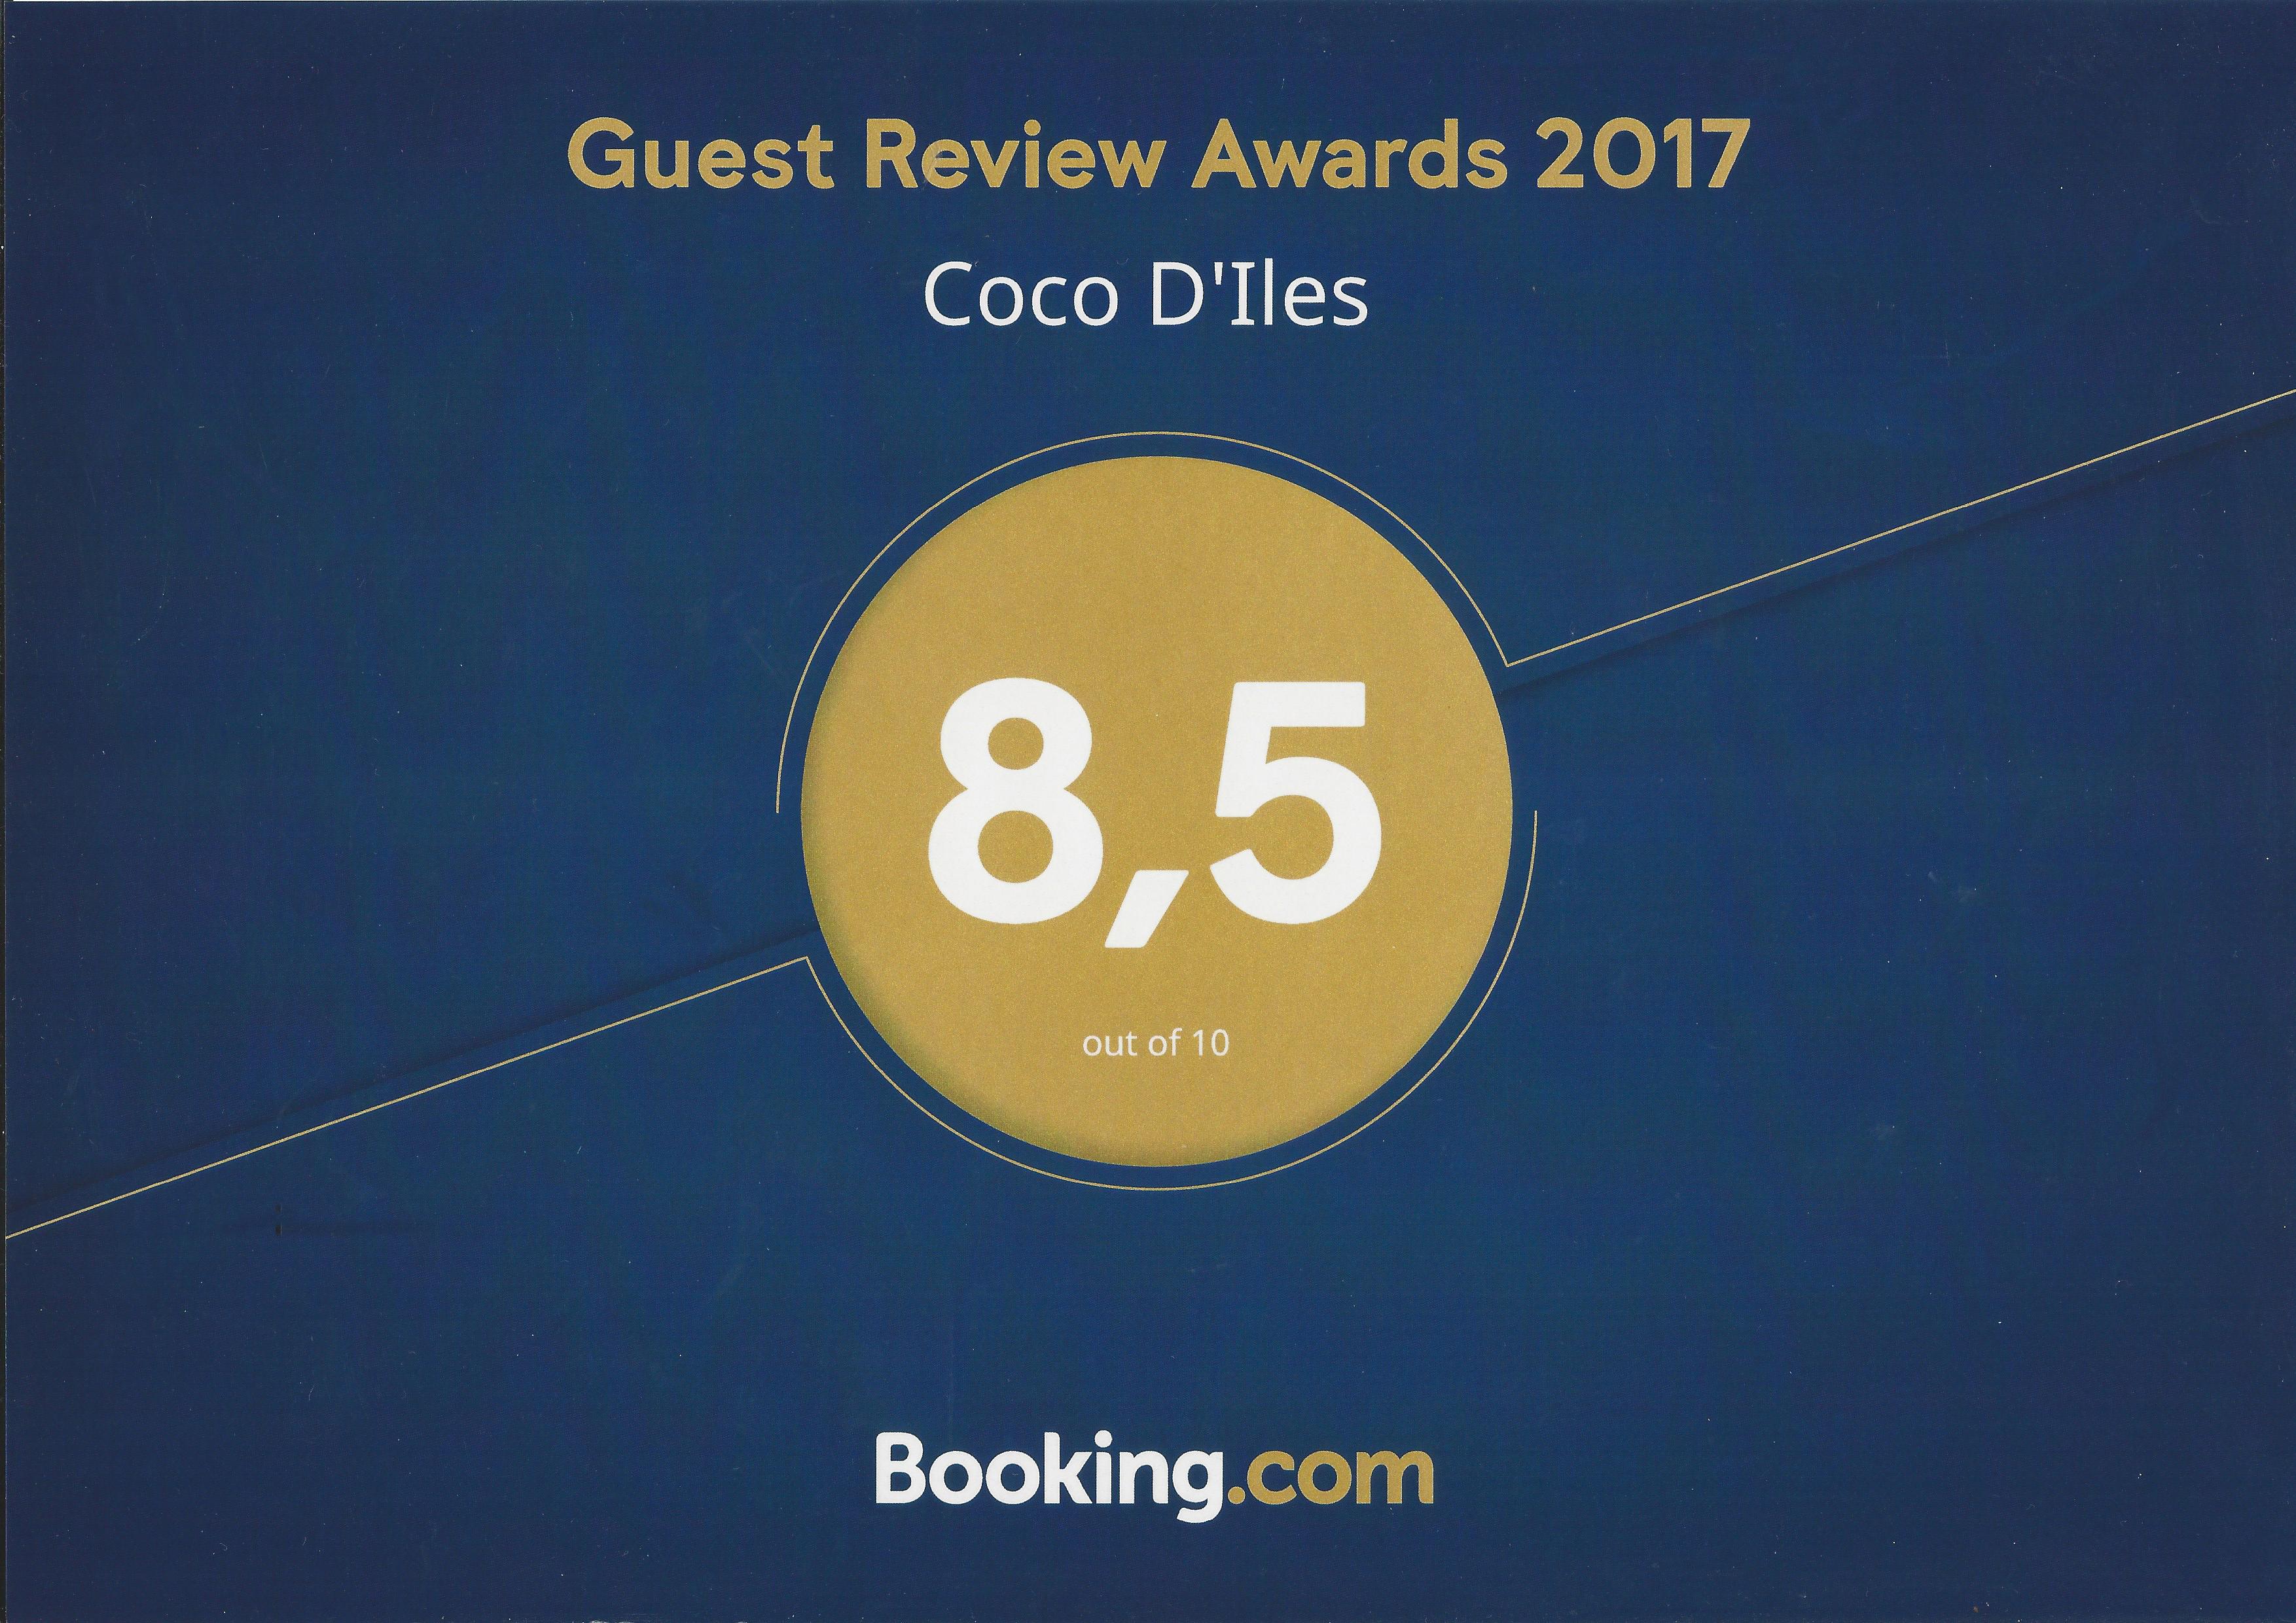 Booking Awards - - Résidence Coco d'Iles - Les Saintes